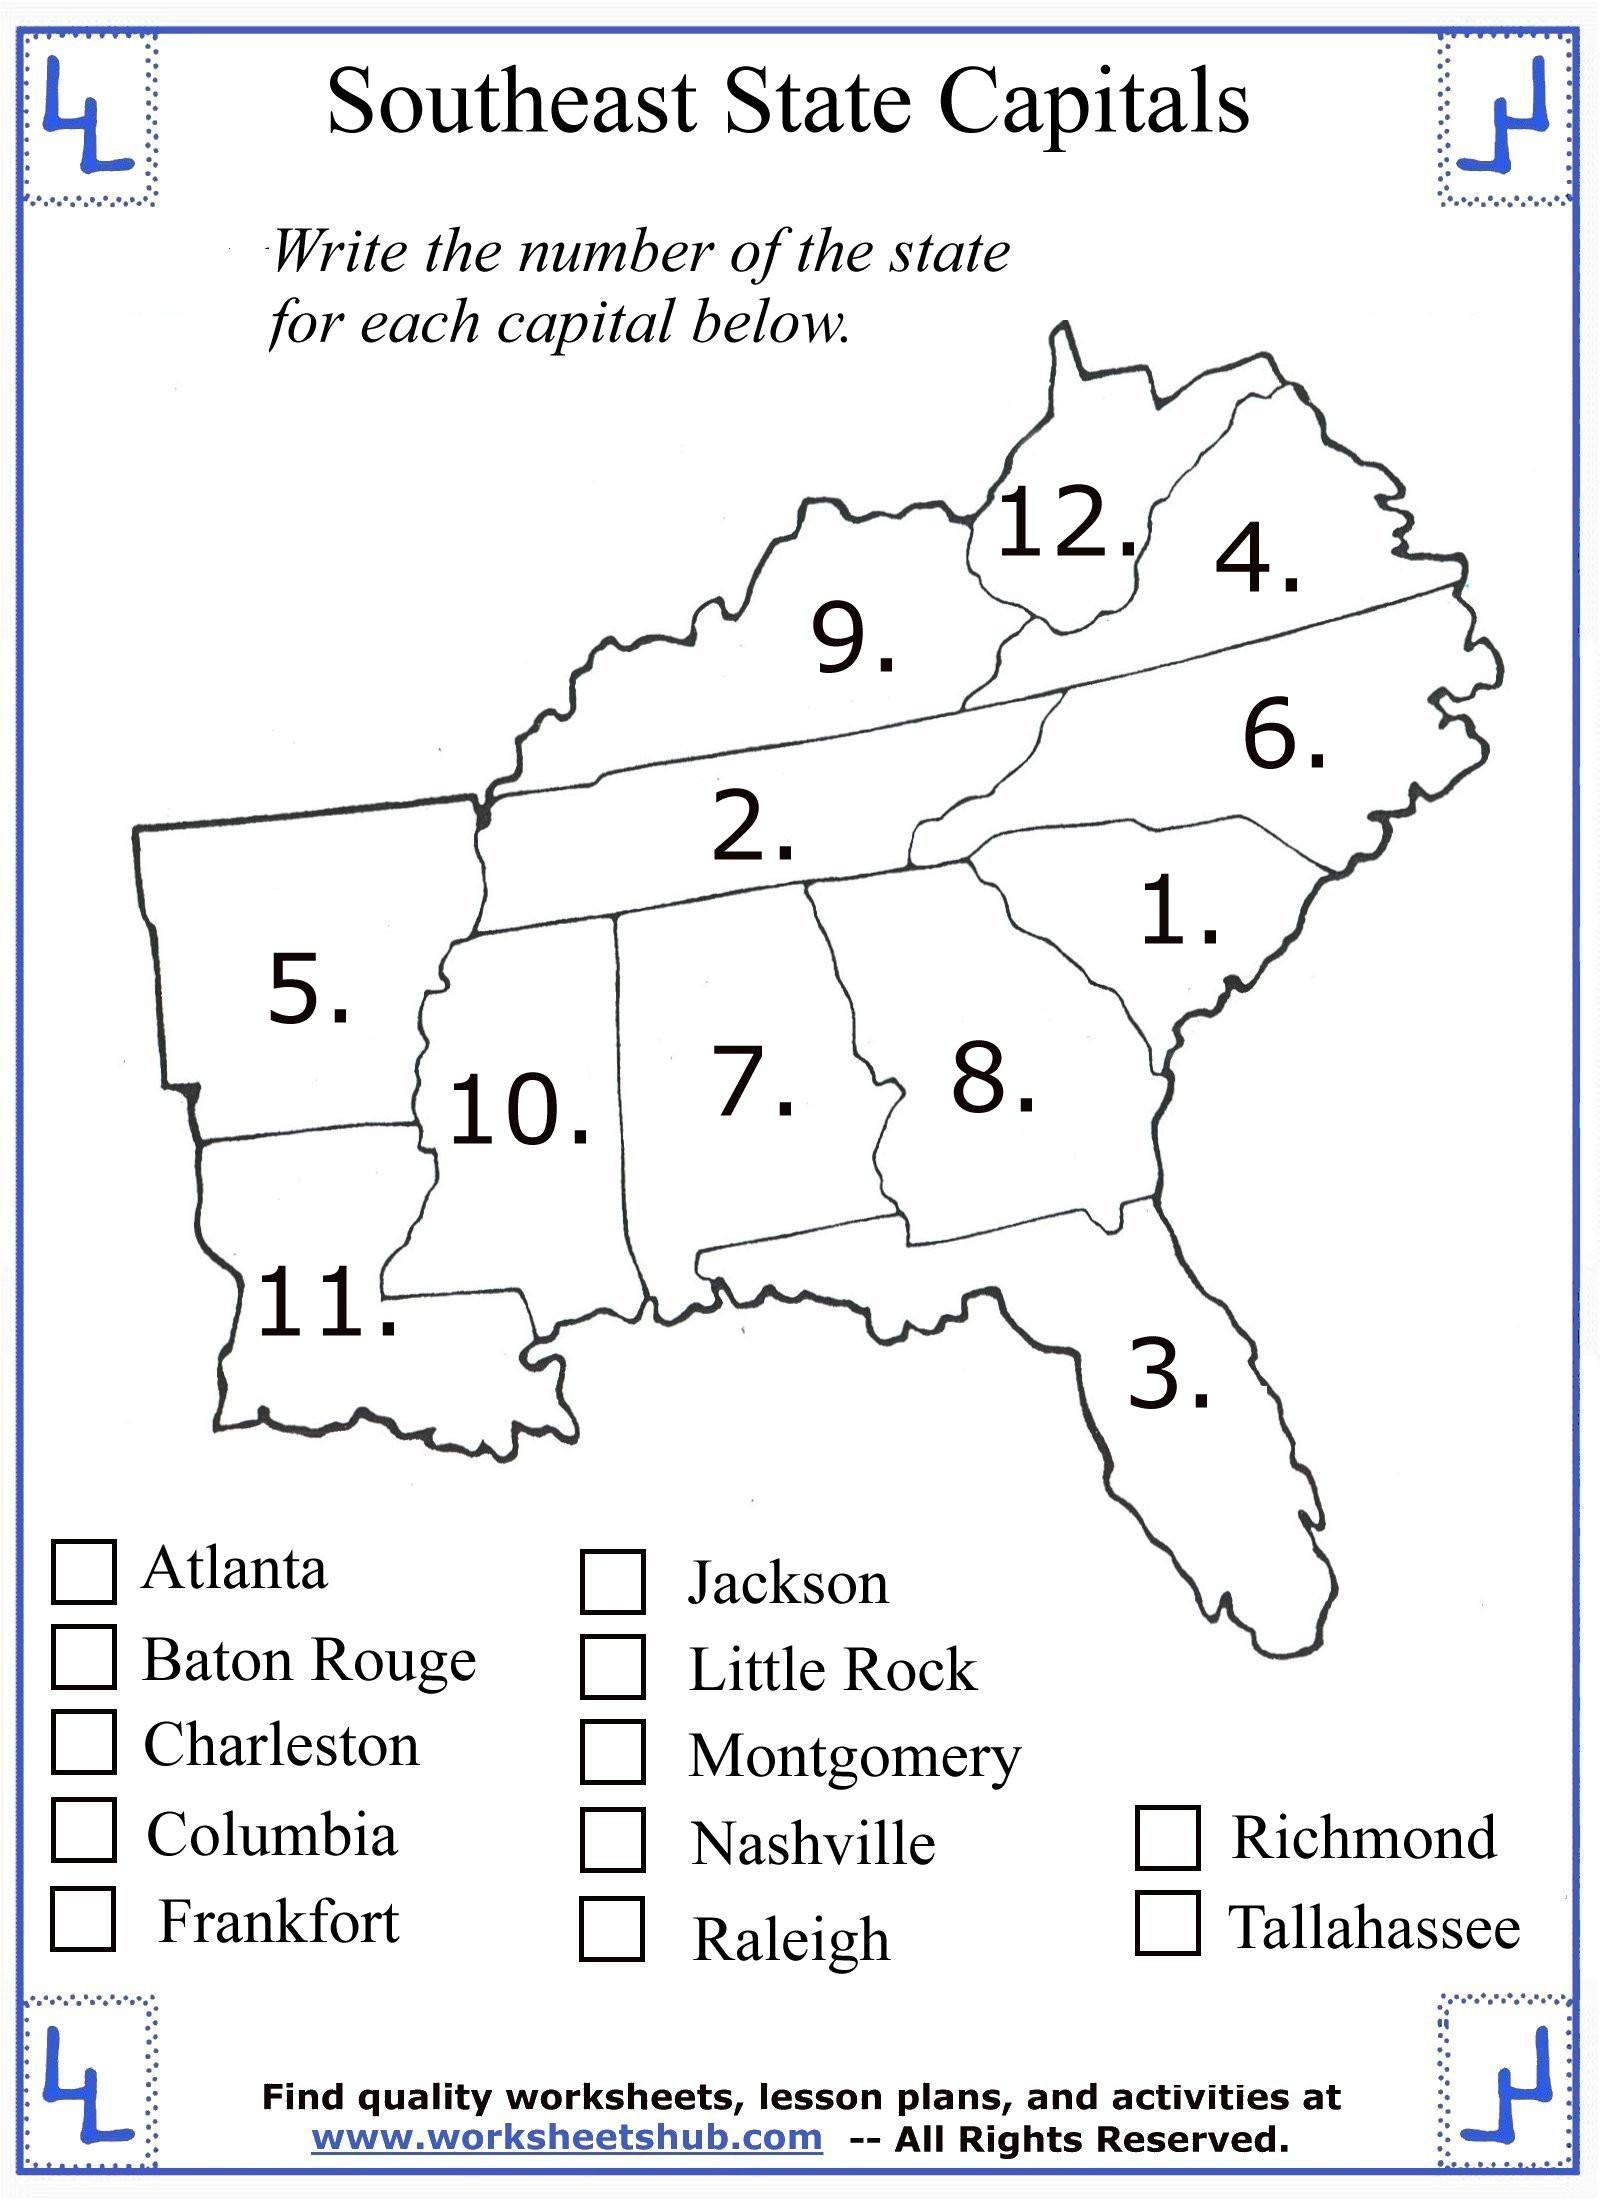 Free Kindergarten social Studies Worksheets 4th Grade social Stu S southeast Region States